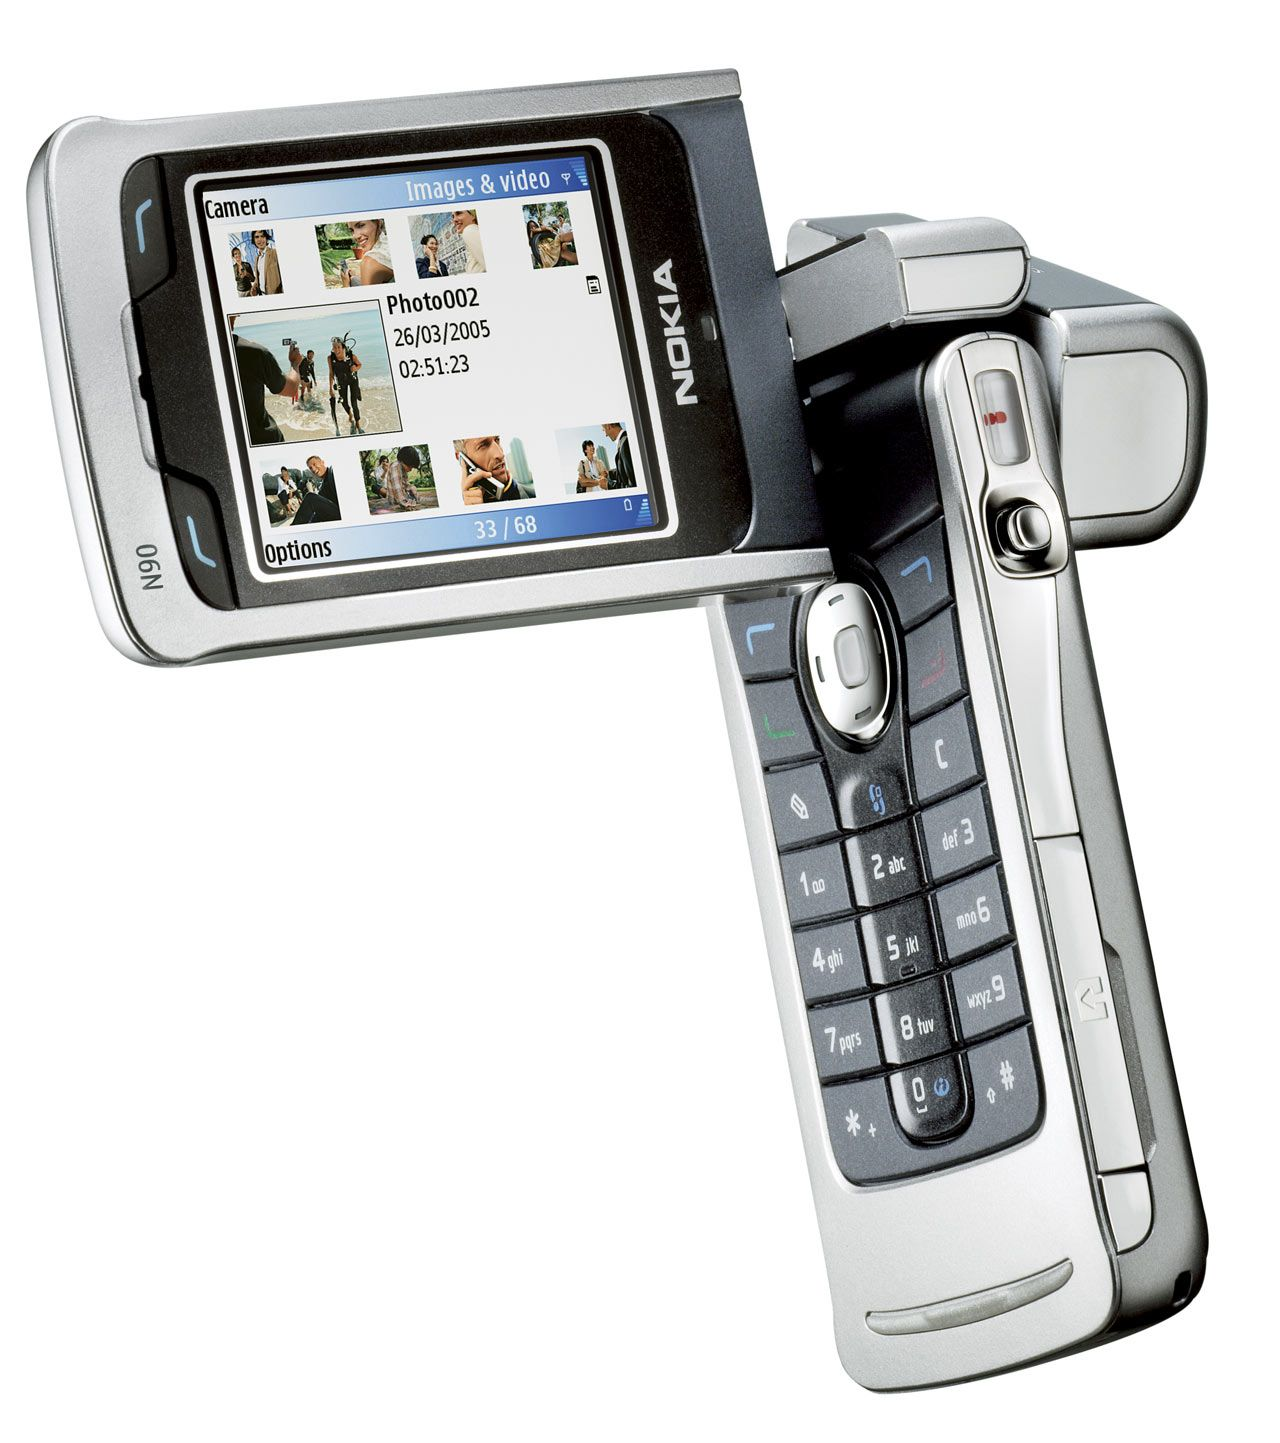 Nokia N90 satte standarden for kameramobiler. Den kom med 3 ganger optisk zoom.